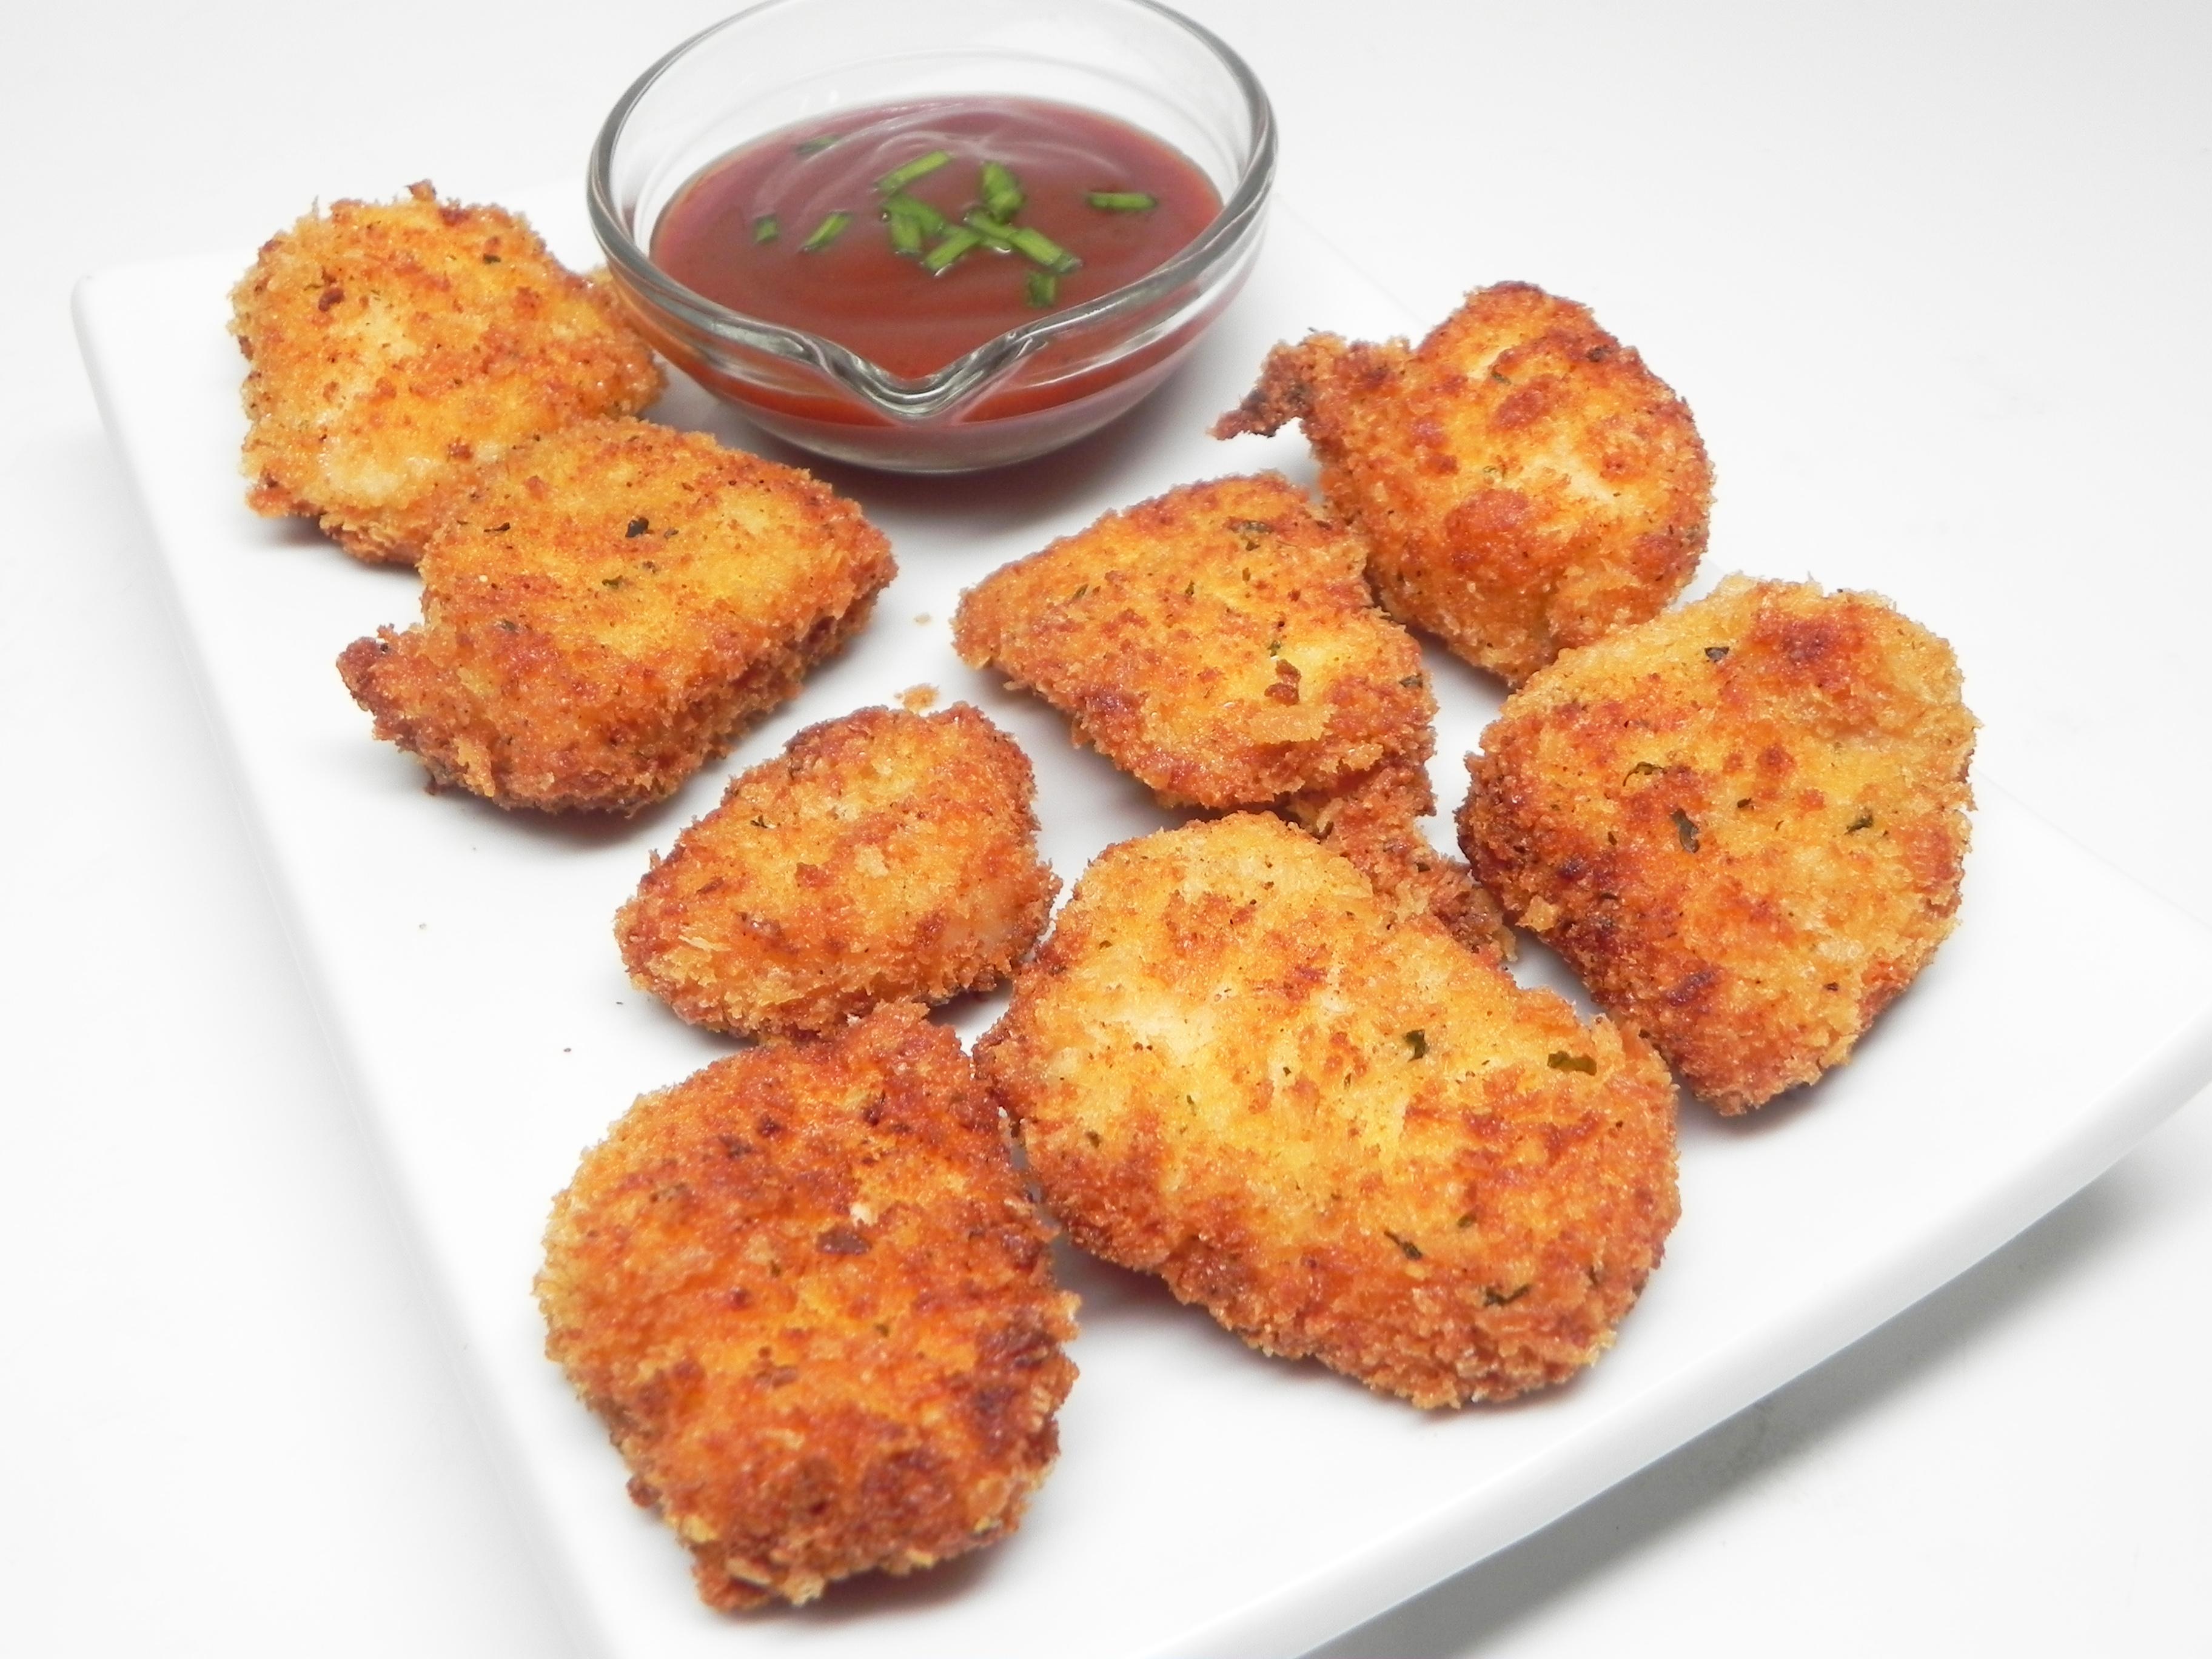 Parmesan Panko Chicken Poppers